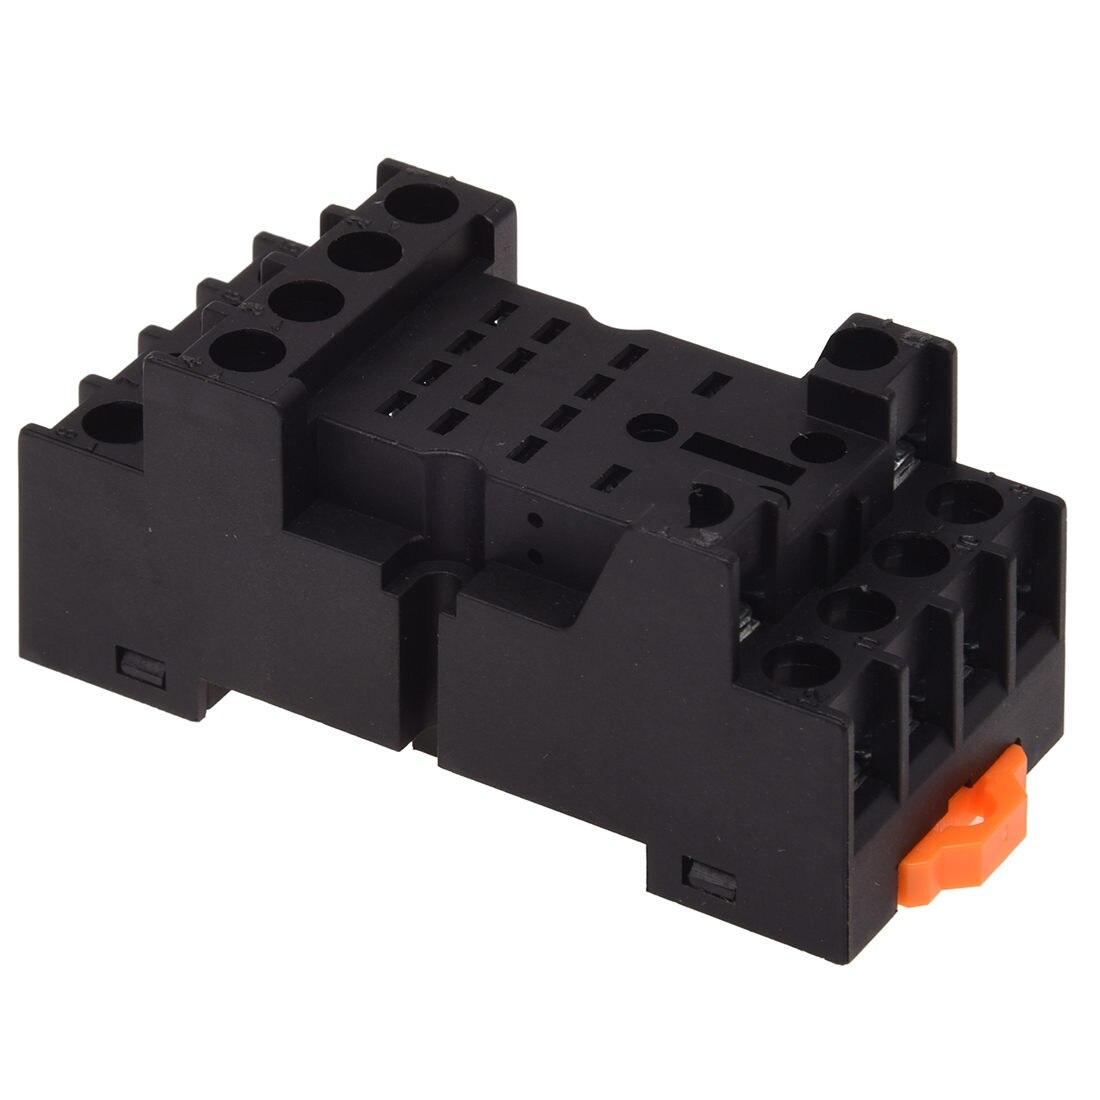 Pyf14a Din Rail Power Relay Socket Base 14 Pin For My4nj Hh54p My4 Rhaliexpress: 14 Pin Relay Socket At Amf-designs.com